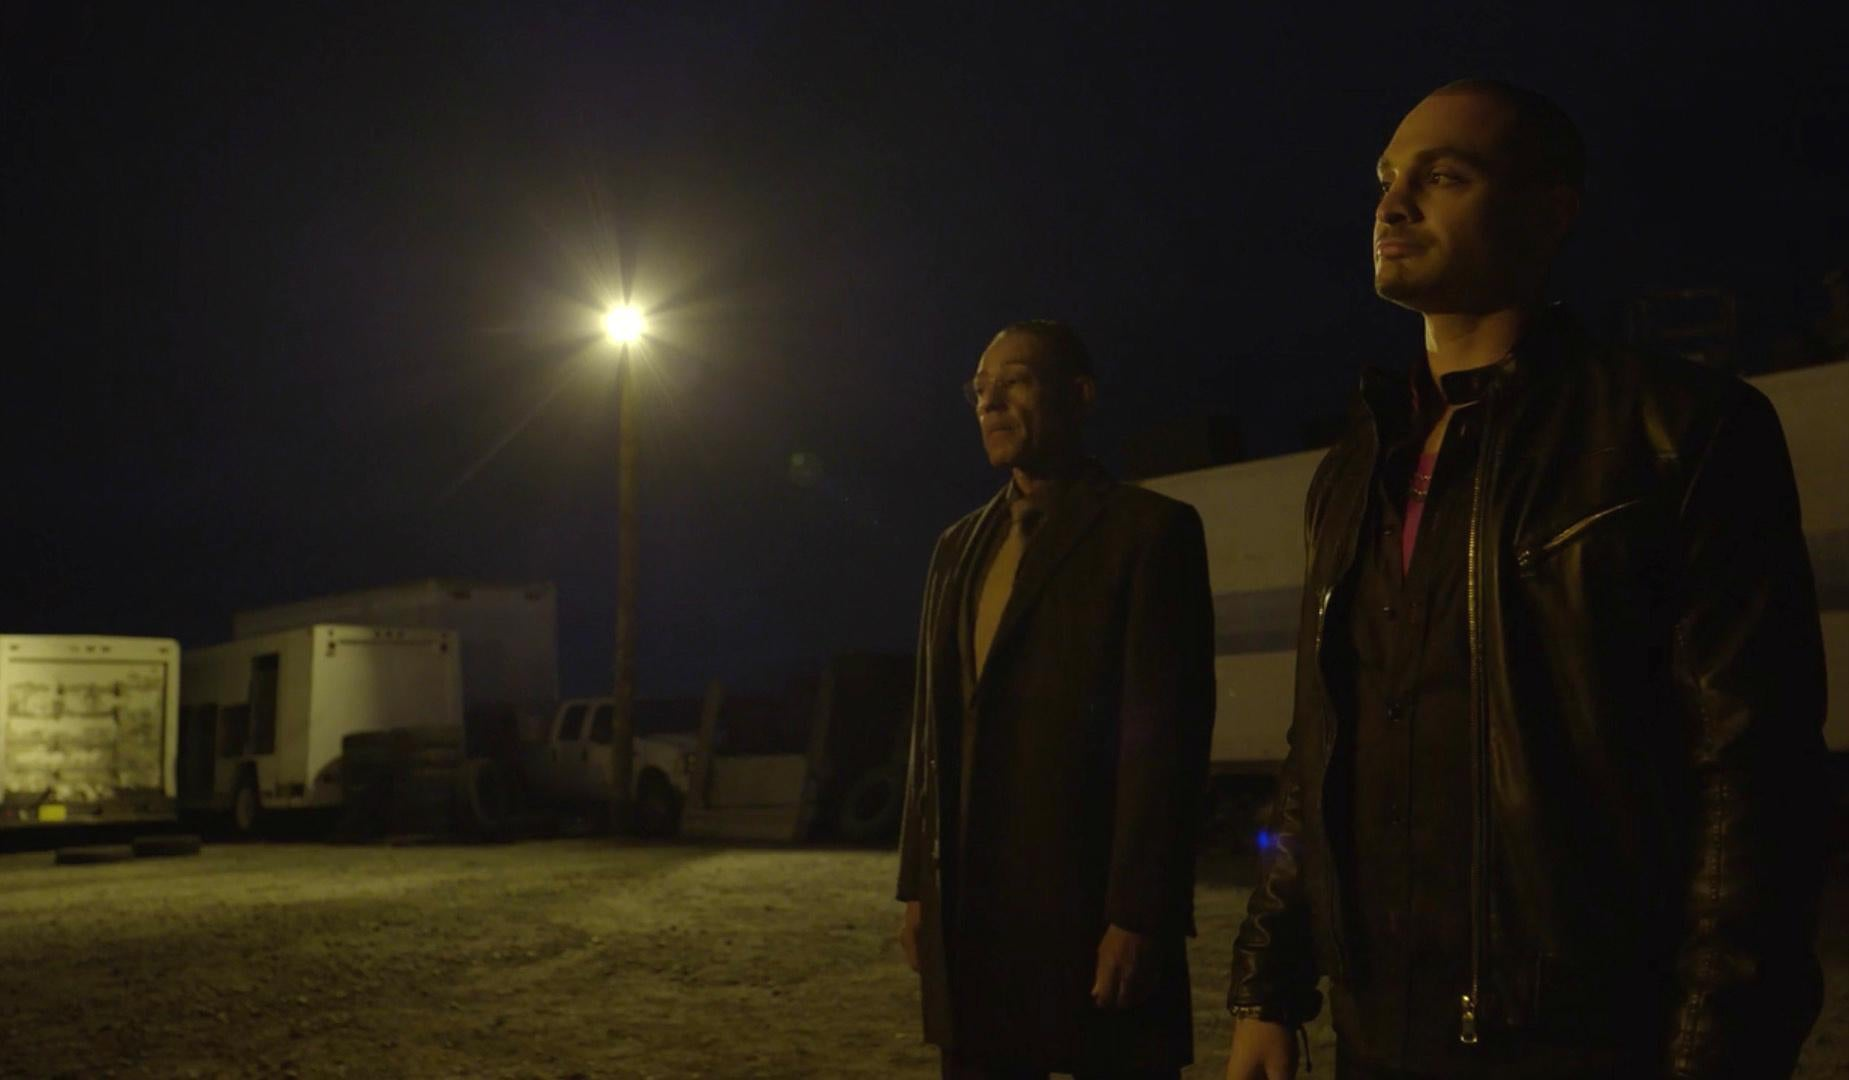 Better Call Saul season 3 episode 10 'Lantern' finale review: Is that it ...